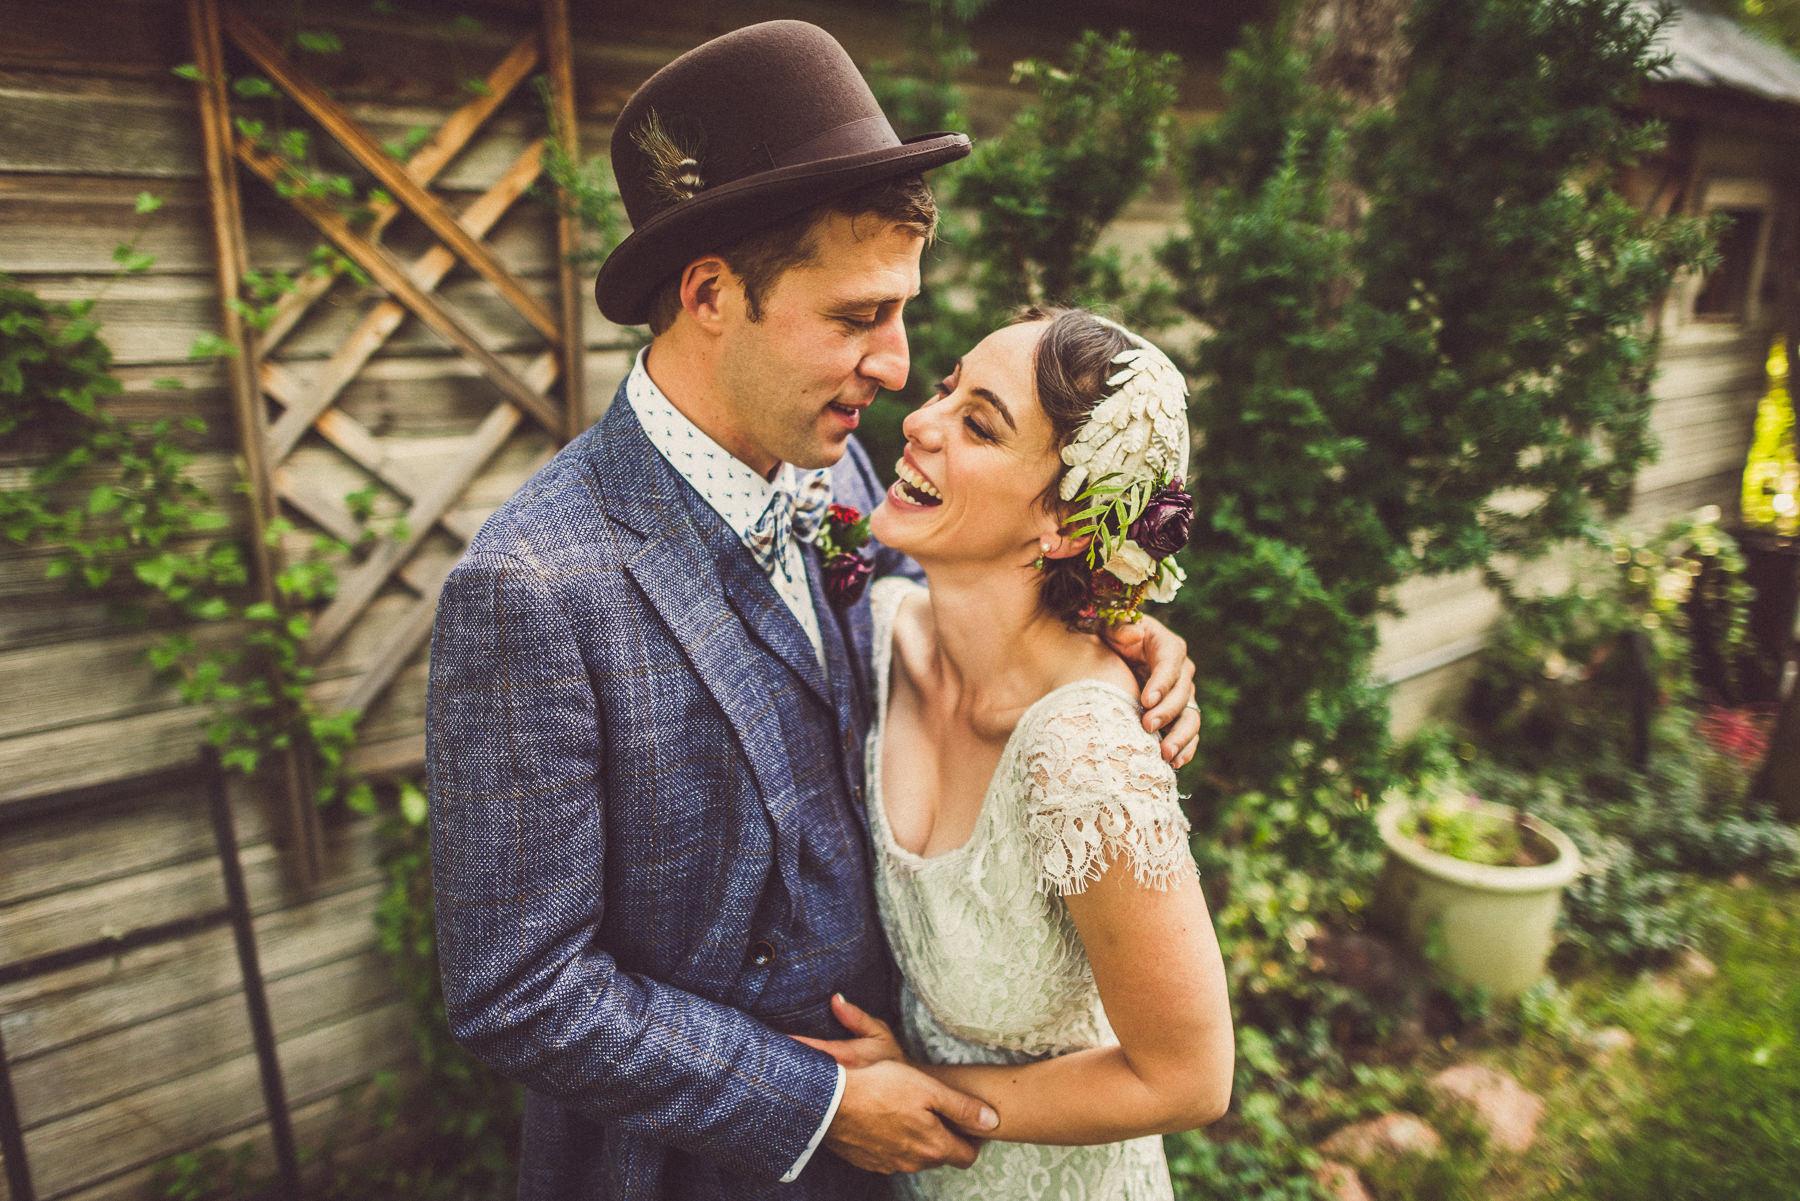 Wedding portrait photography of couple at their Hillside Gardens & Events Center wedding